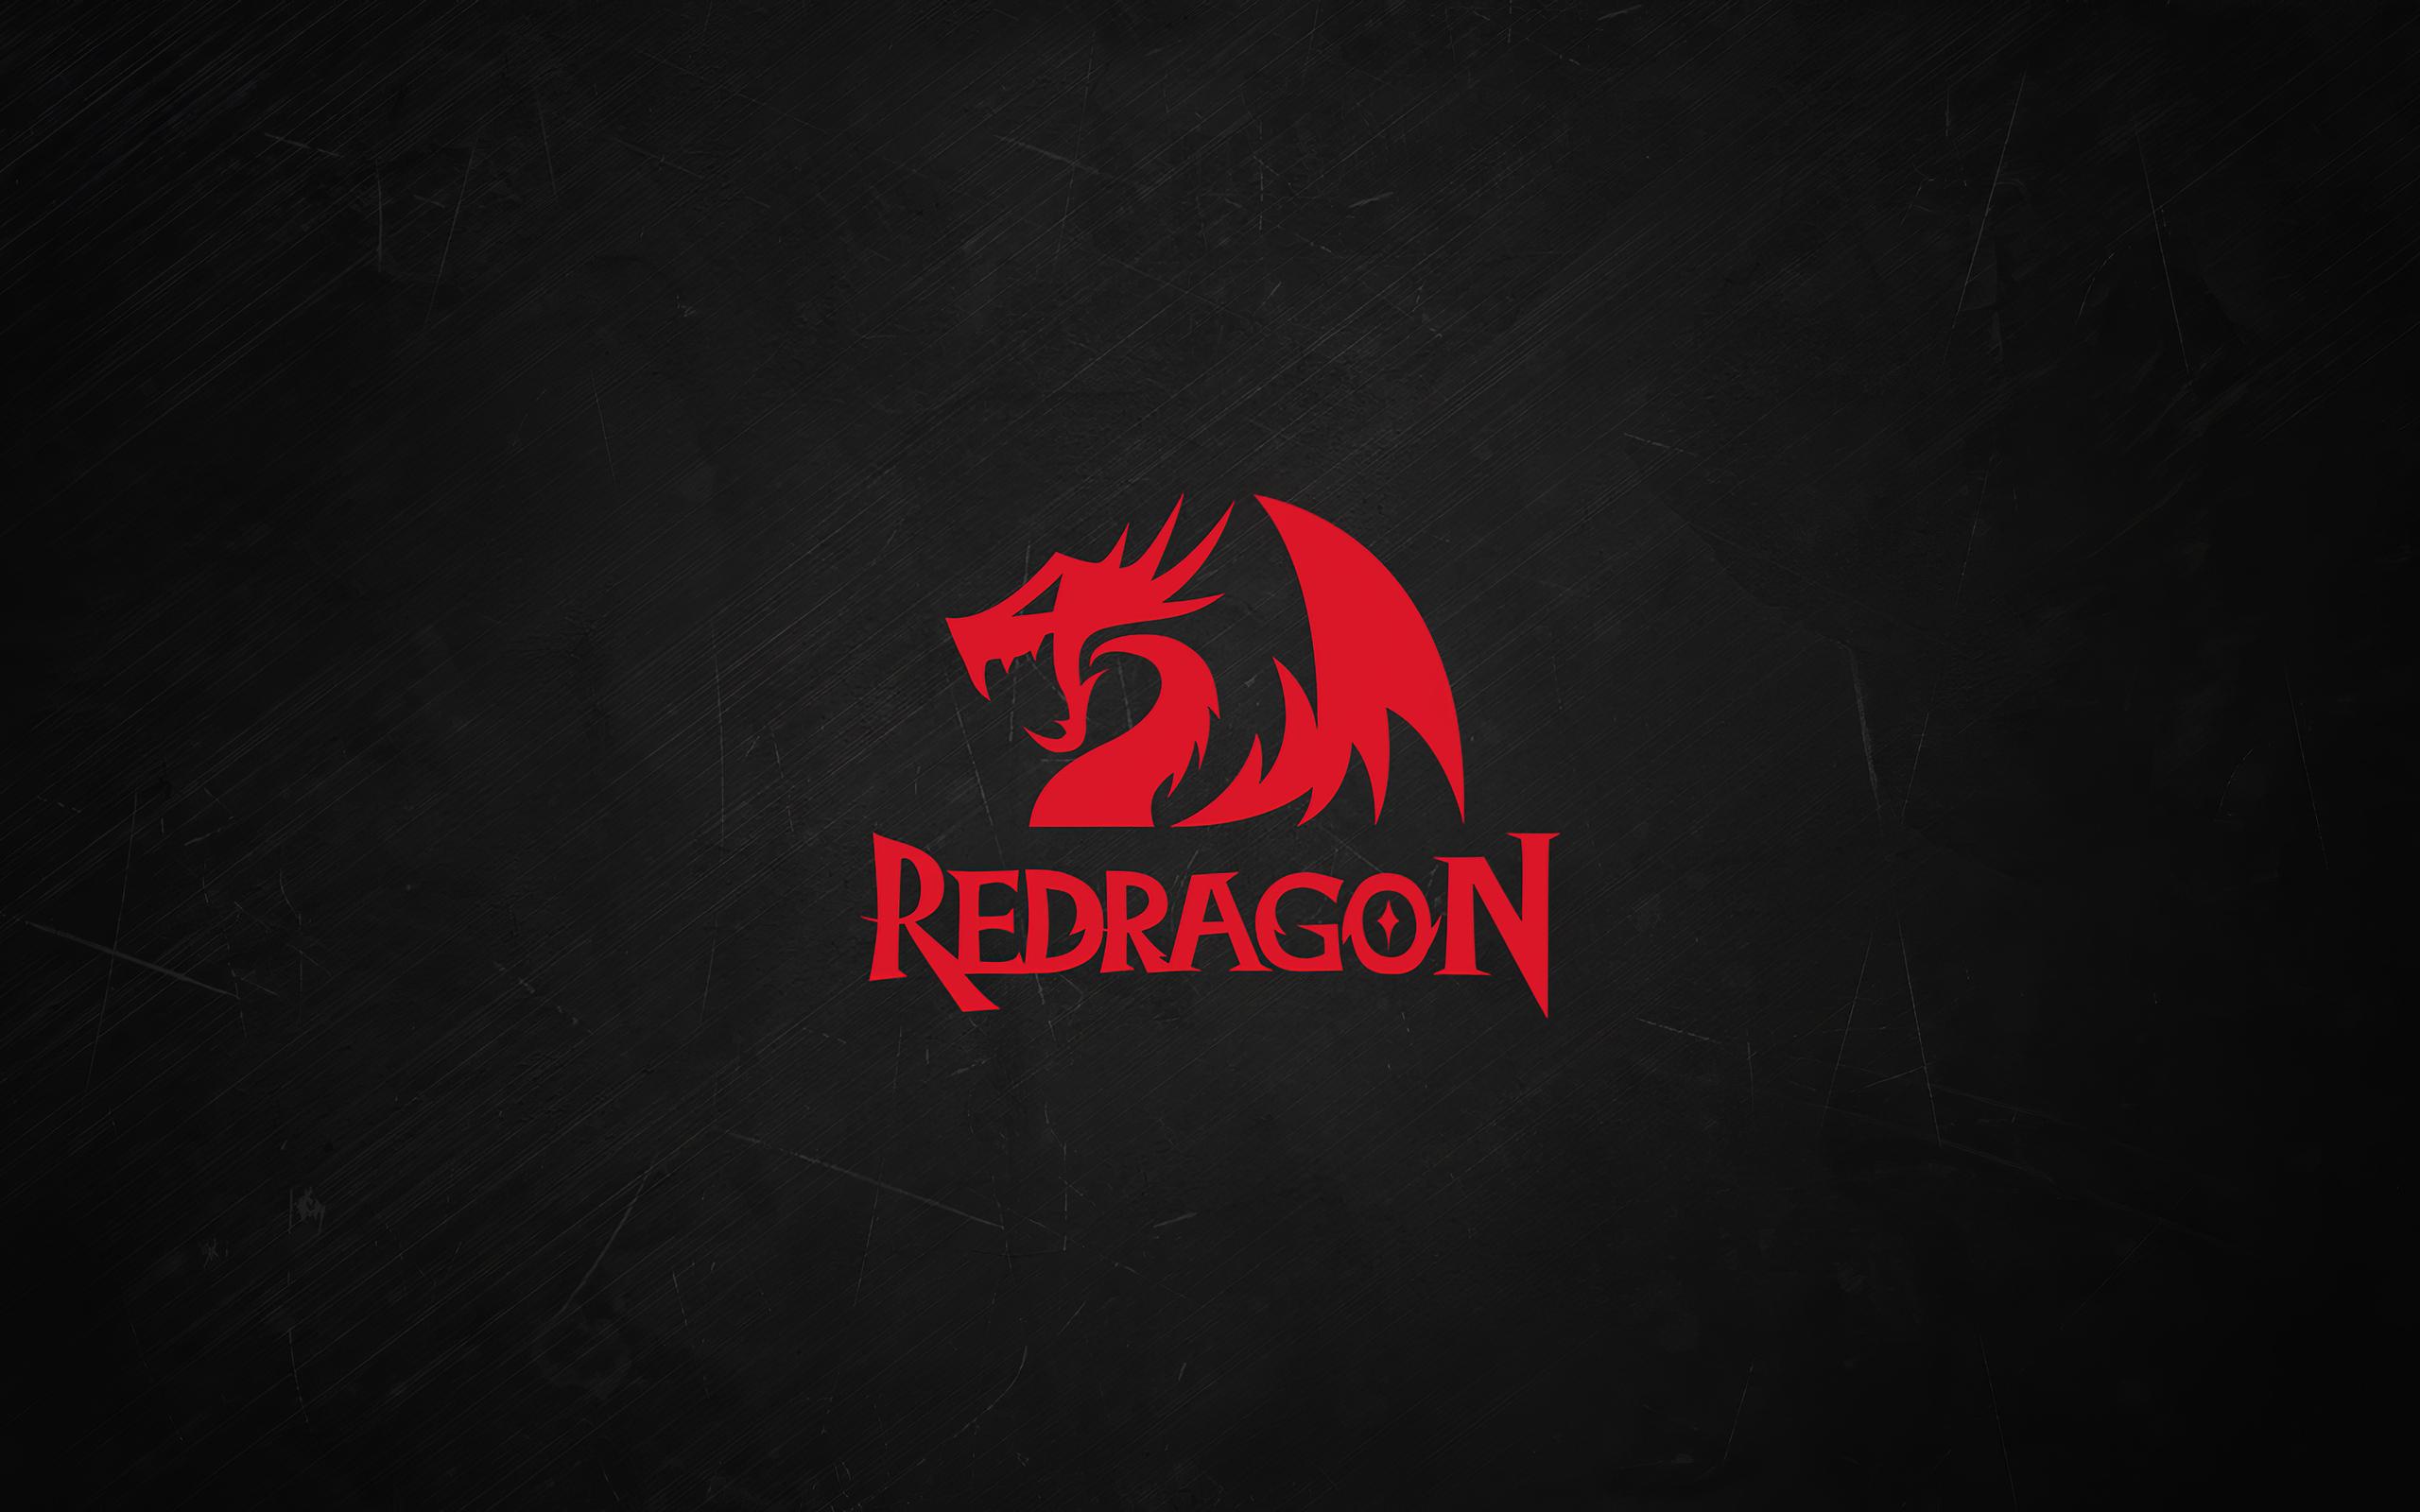 red-dragon-minimal-logo-4k-bs.jpg